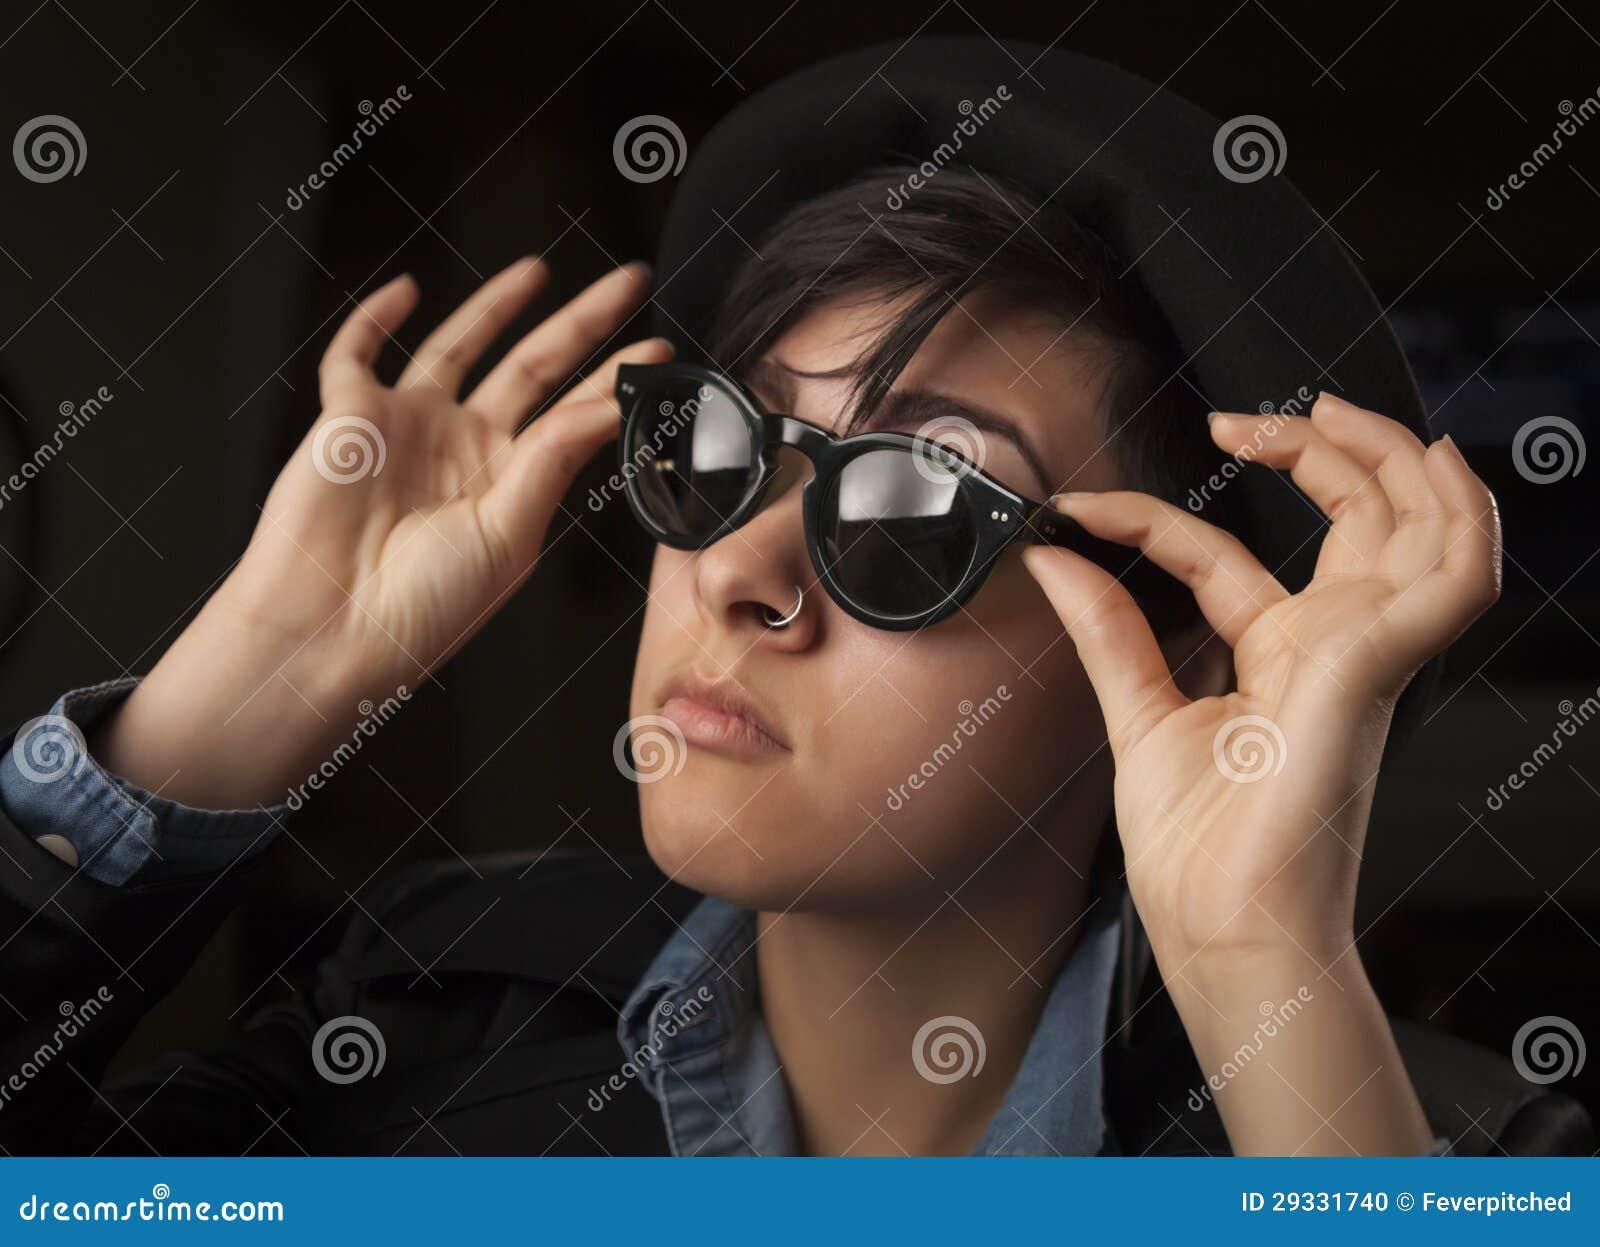 Etnisch Gemengd Meisje die Zonnebril dragen